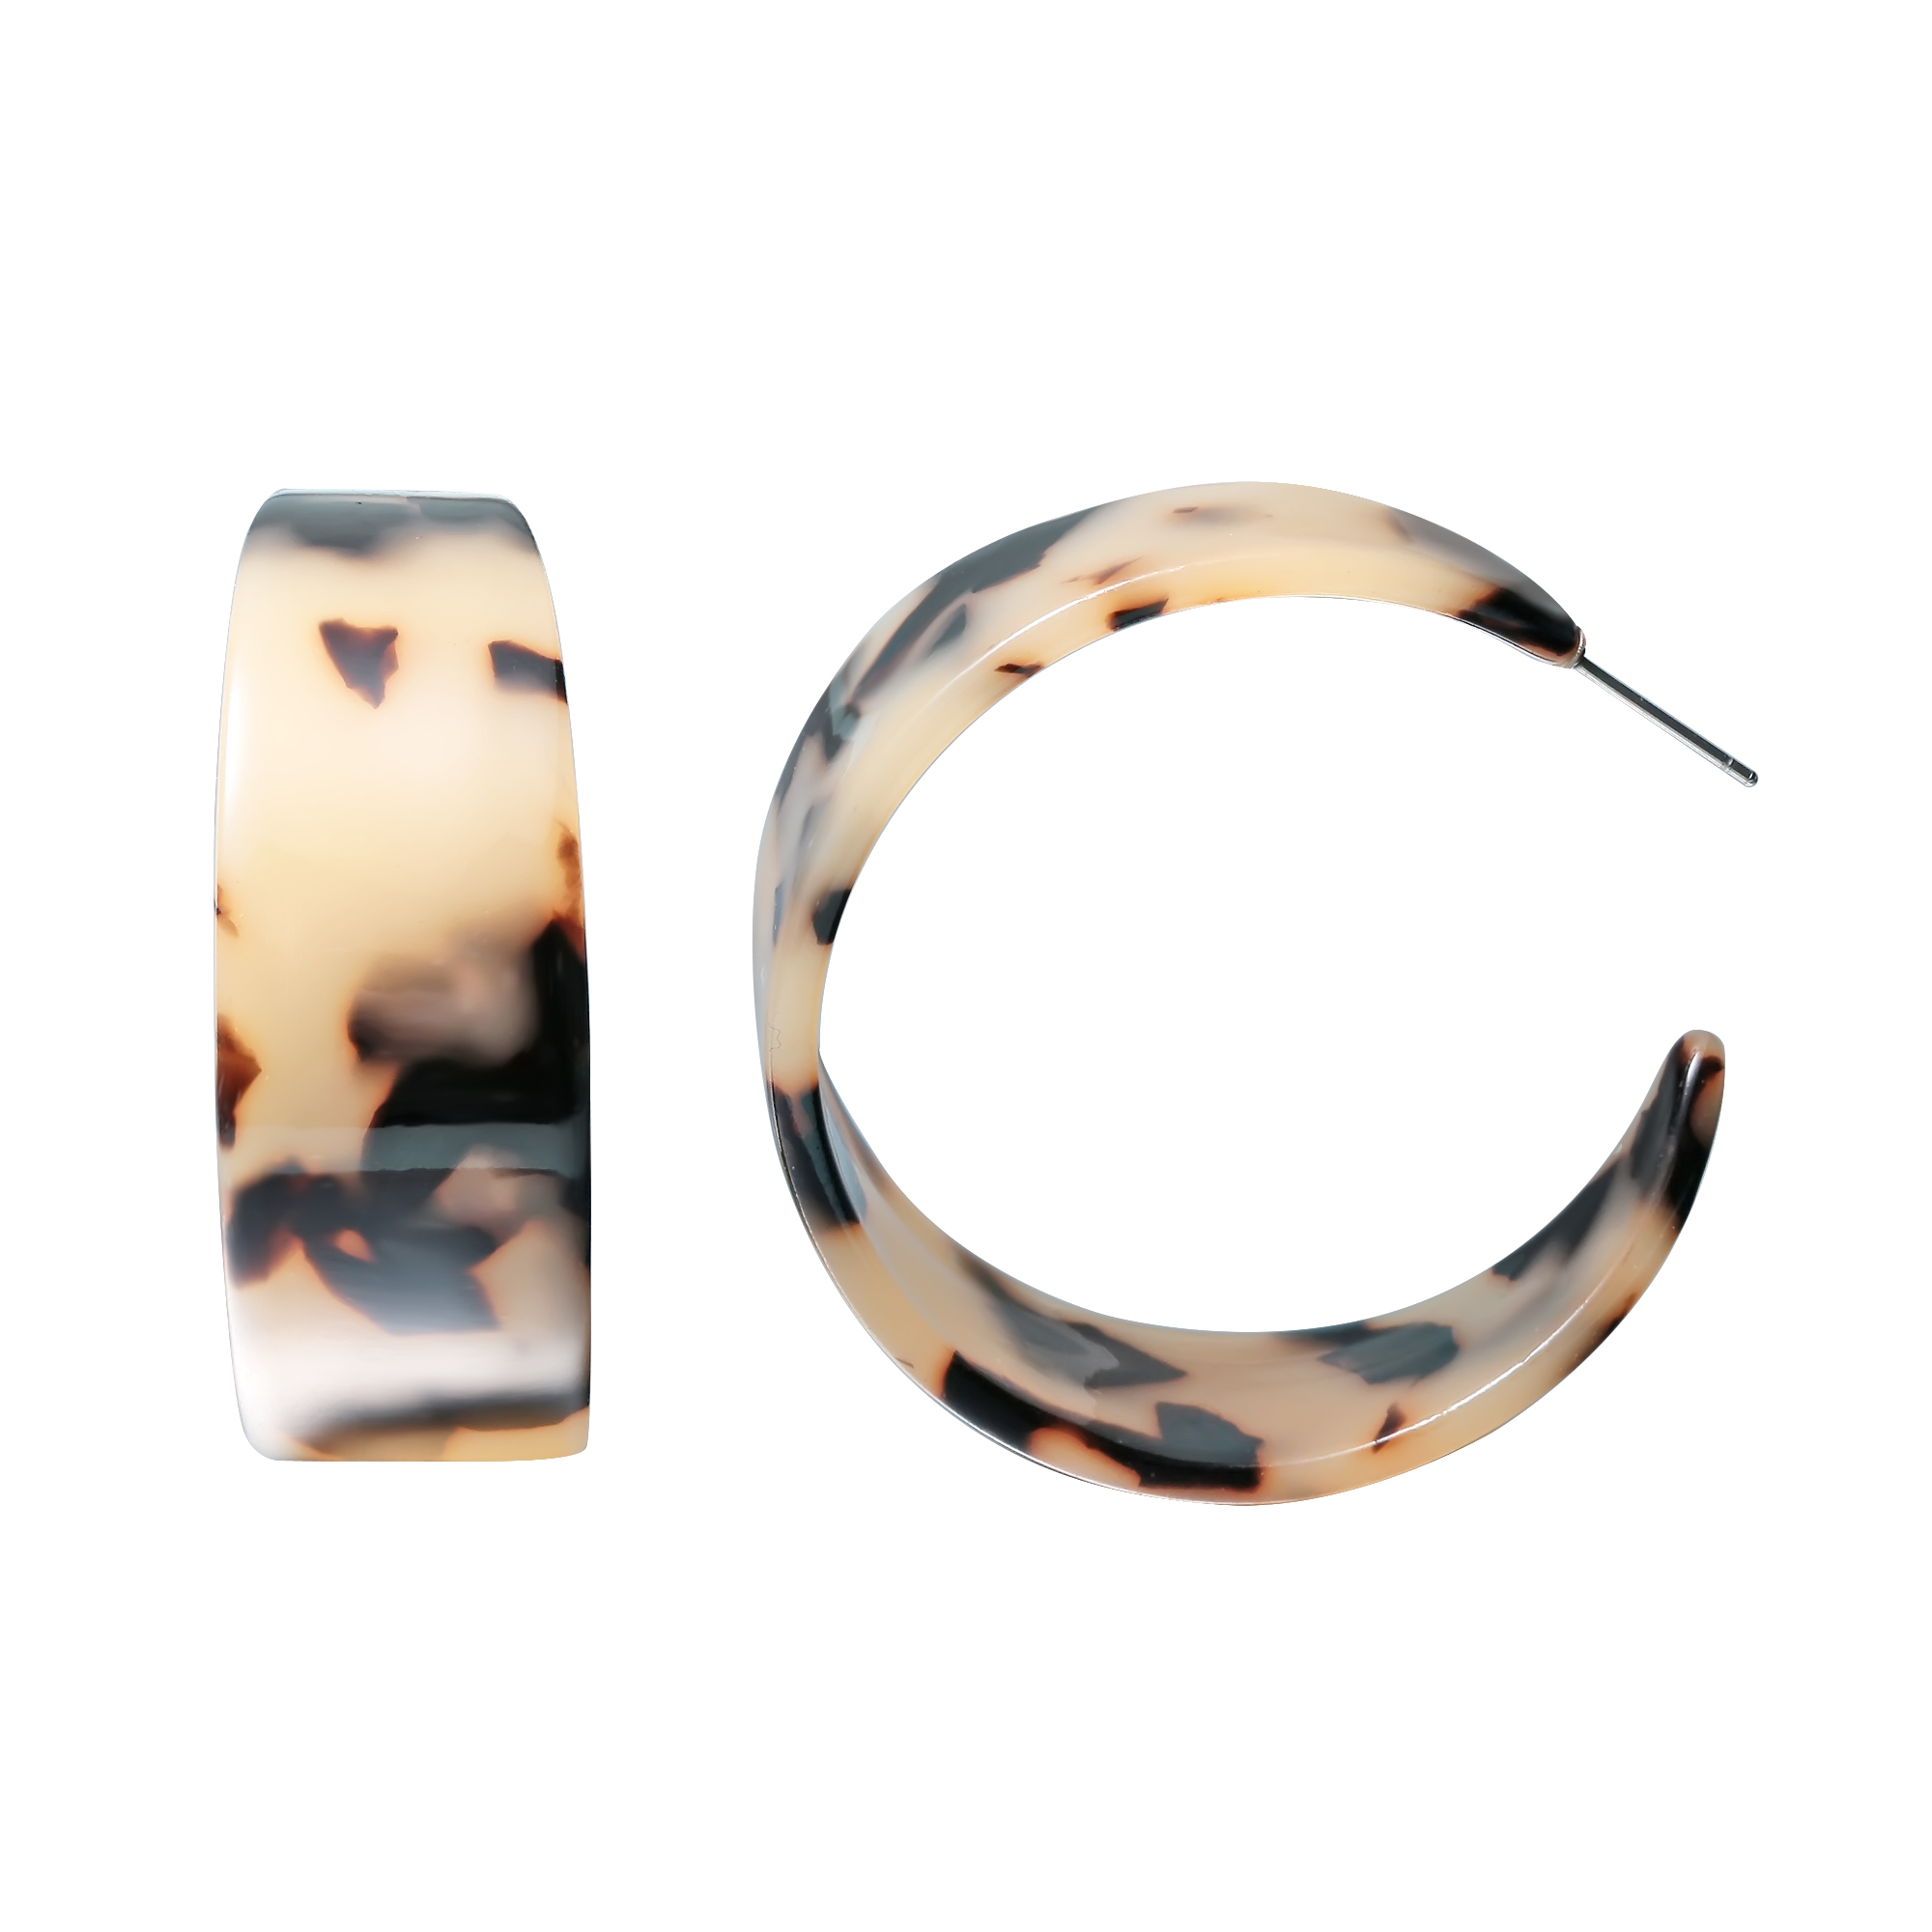 Vintage Jewelry Oversize Circle Hoop Earrings For Women Round Geometry Earings Fashion Jewelry Gifts Pendientes Mujer Moda 2018 in Hoop Earrings from Jewelry Accessories